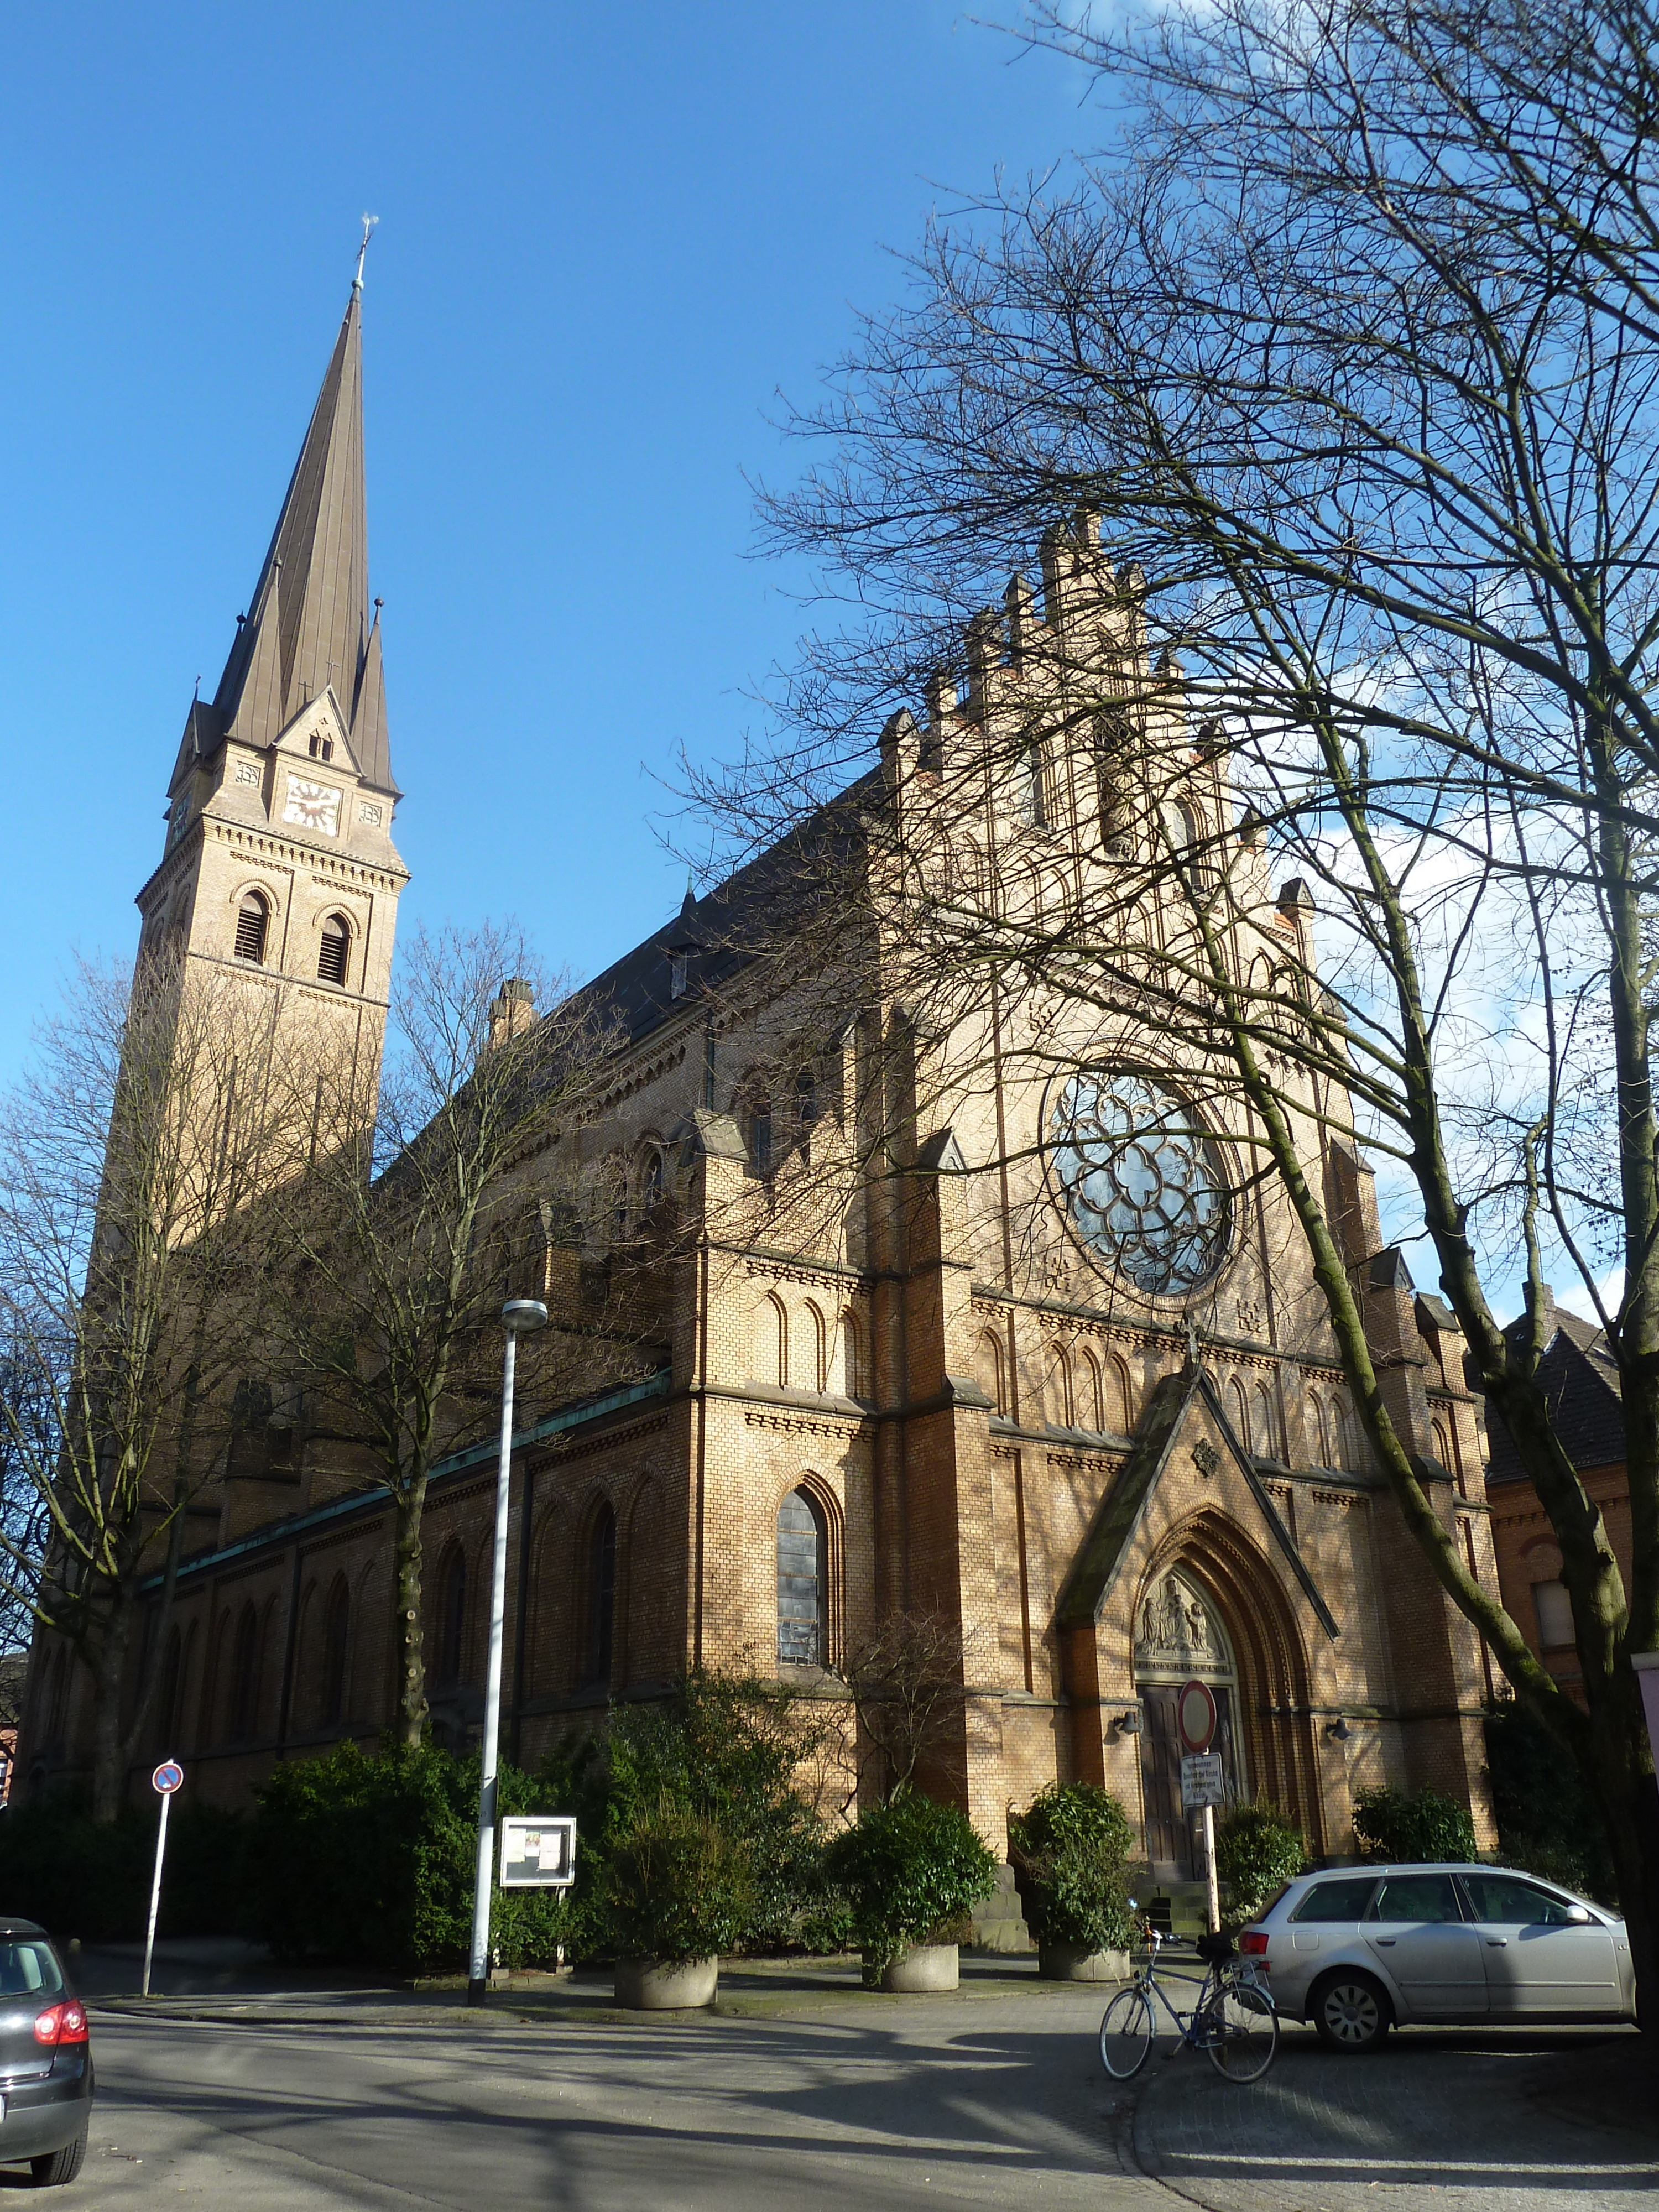 File:Kath. Kirche Mariae Rosenkranz in Mülheim an der Ruhr